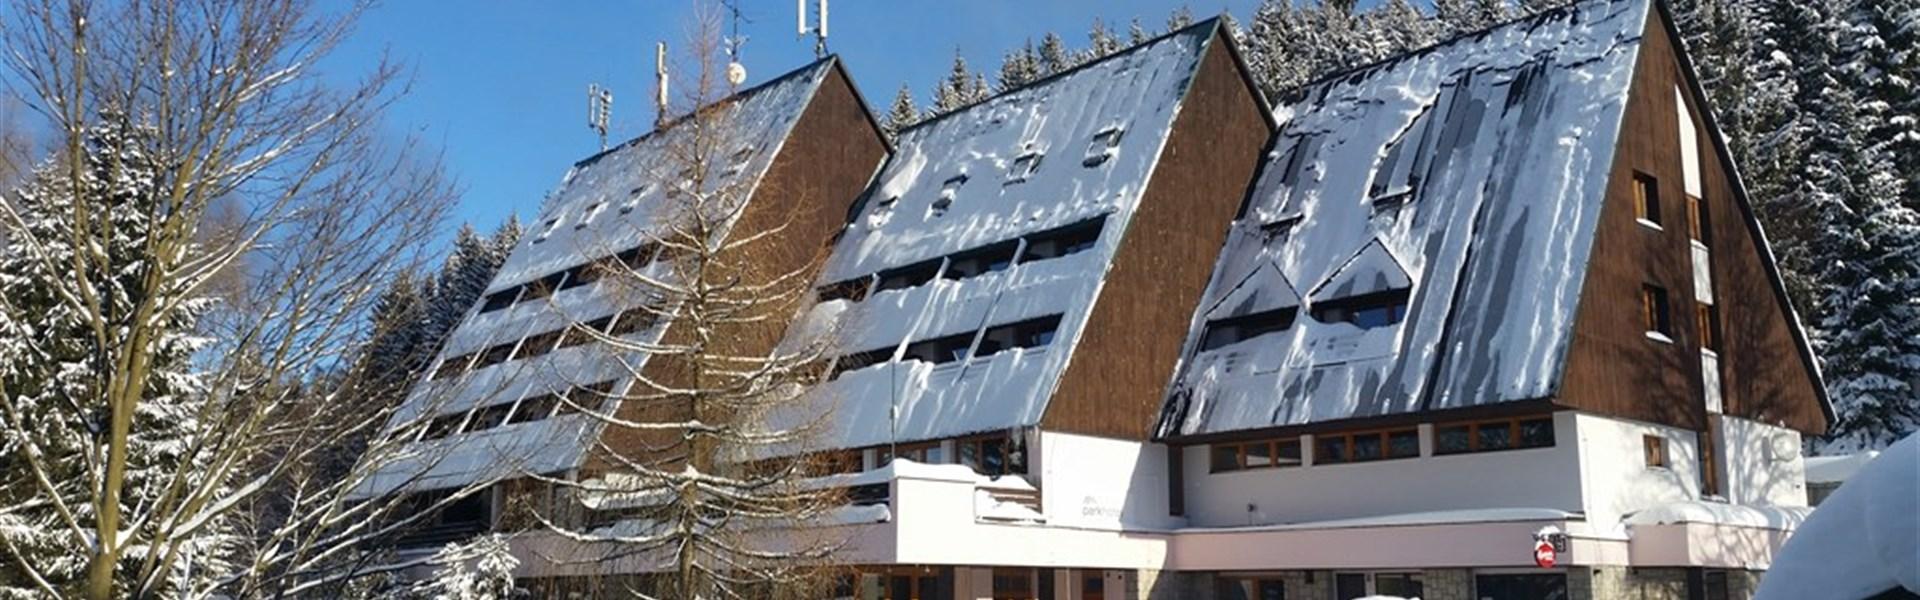 Parkhotel Harrachov - zima -